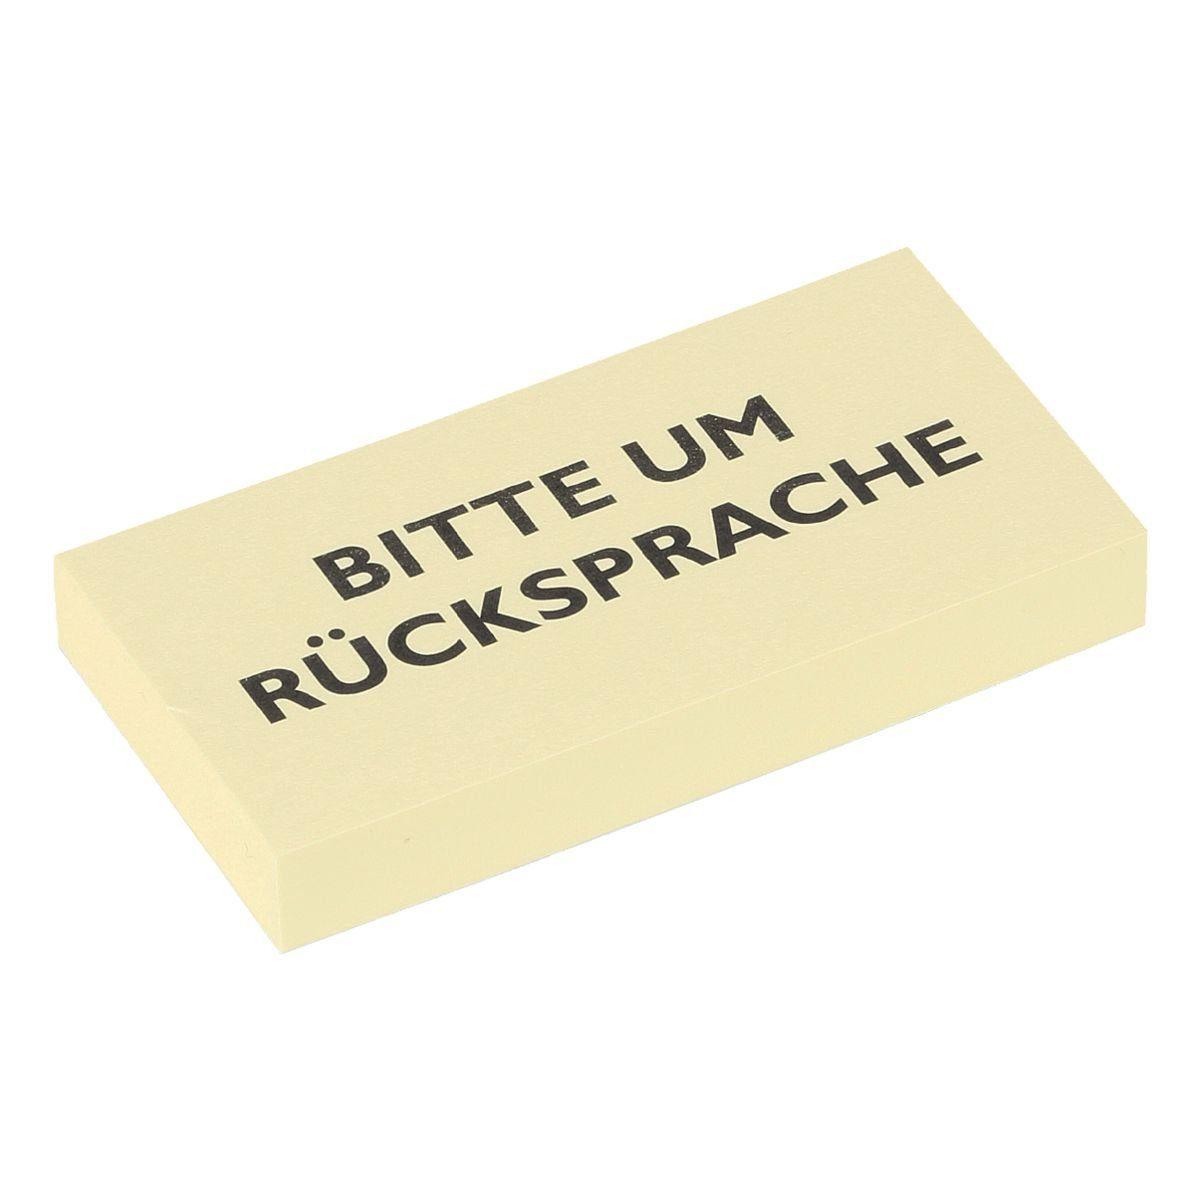 OTTO Office Standard Pagemarker »Rücksprache«